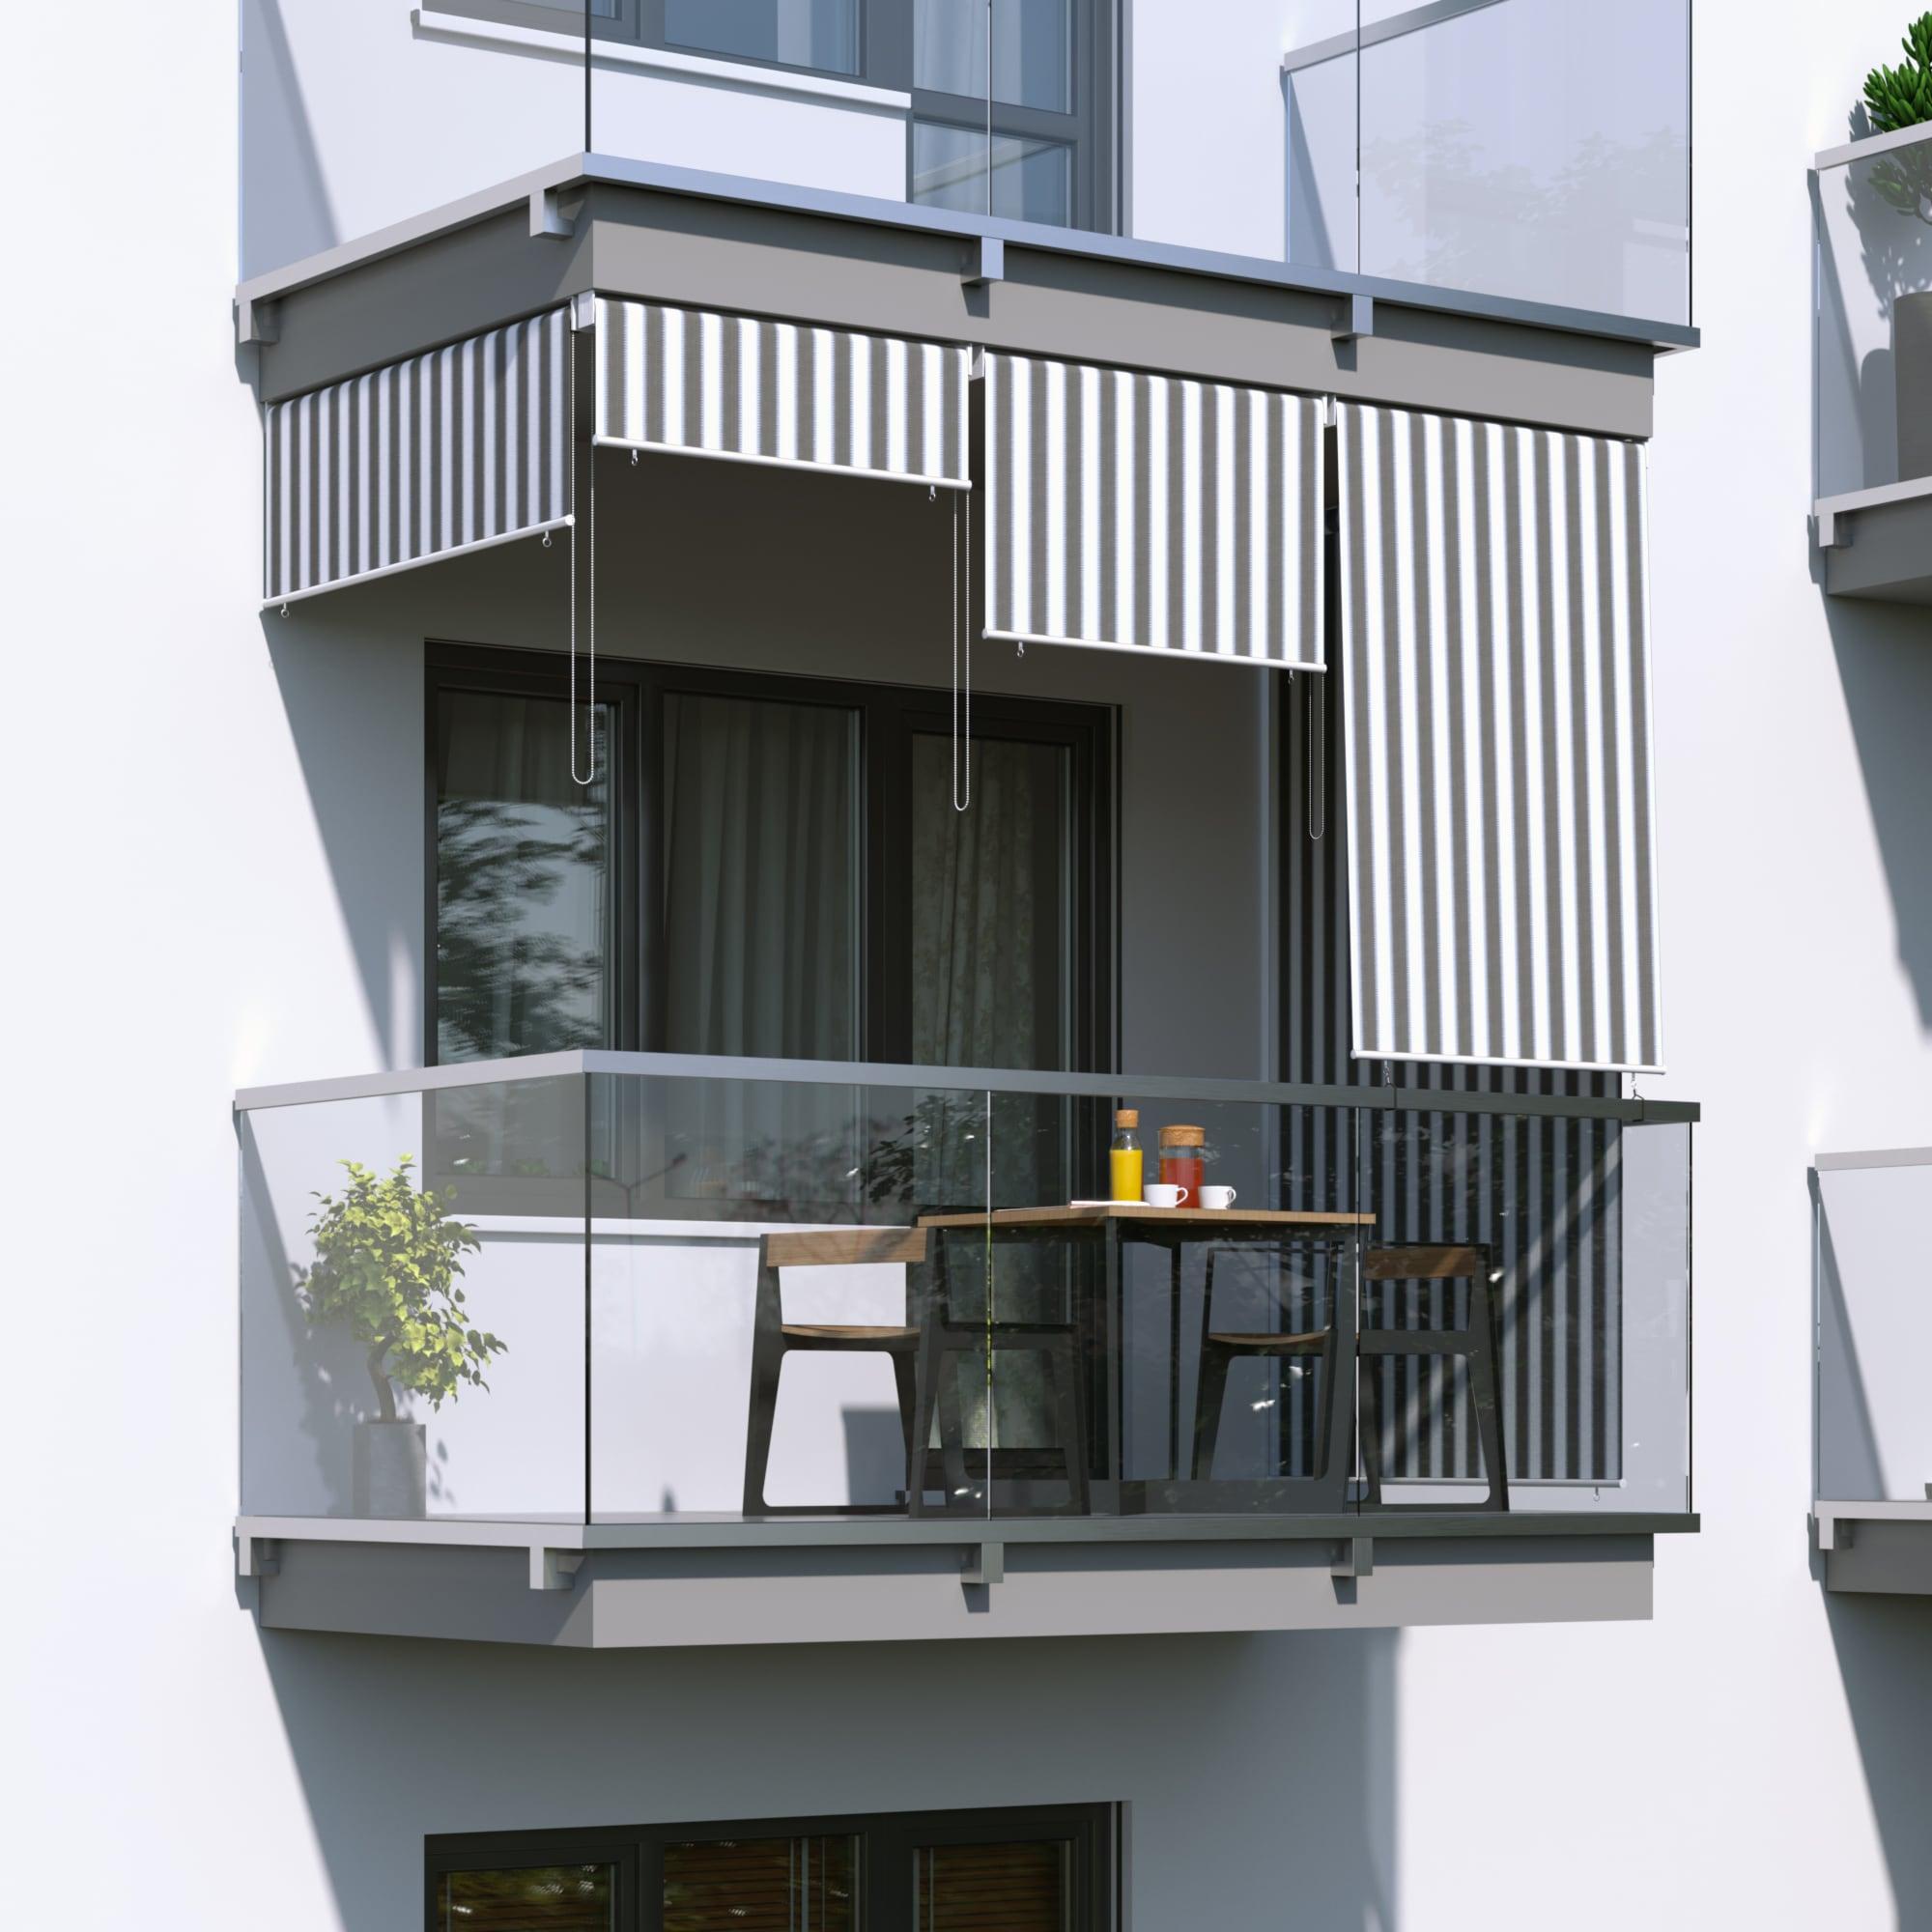 JAROLIFT-Senkrechtmarkise-Sichtschutz-Aussenrollo-Sonnenschutz-Aussen-Rollo-Balkon Indexbild 33